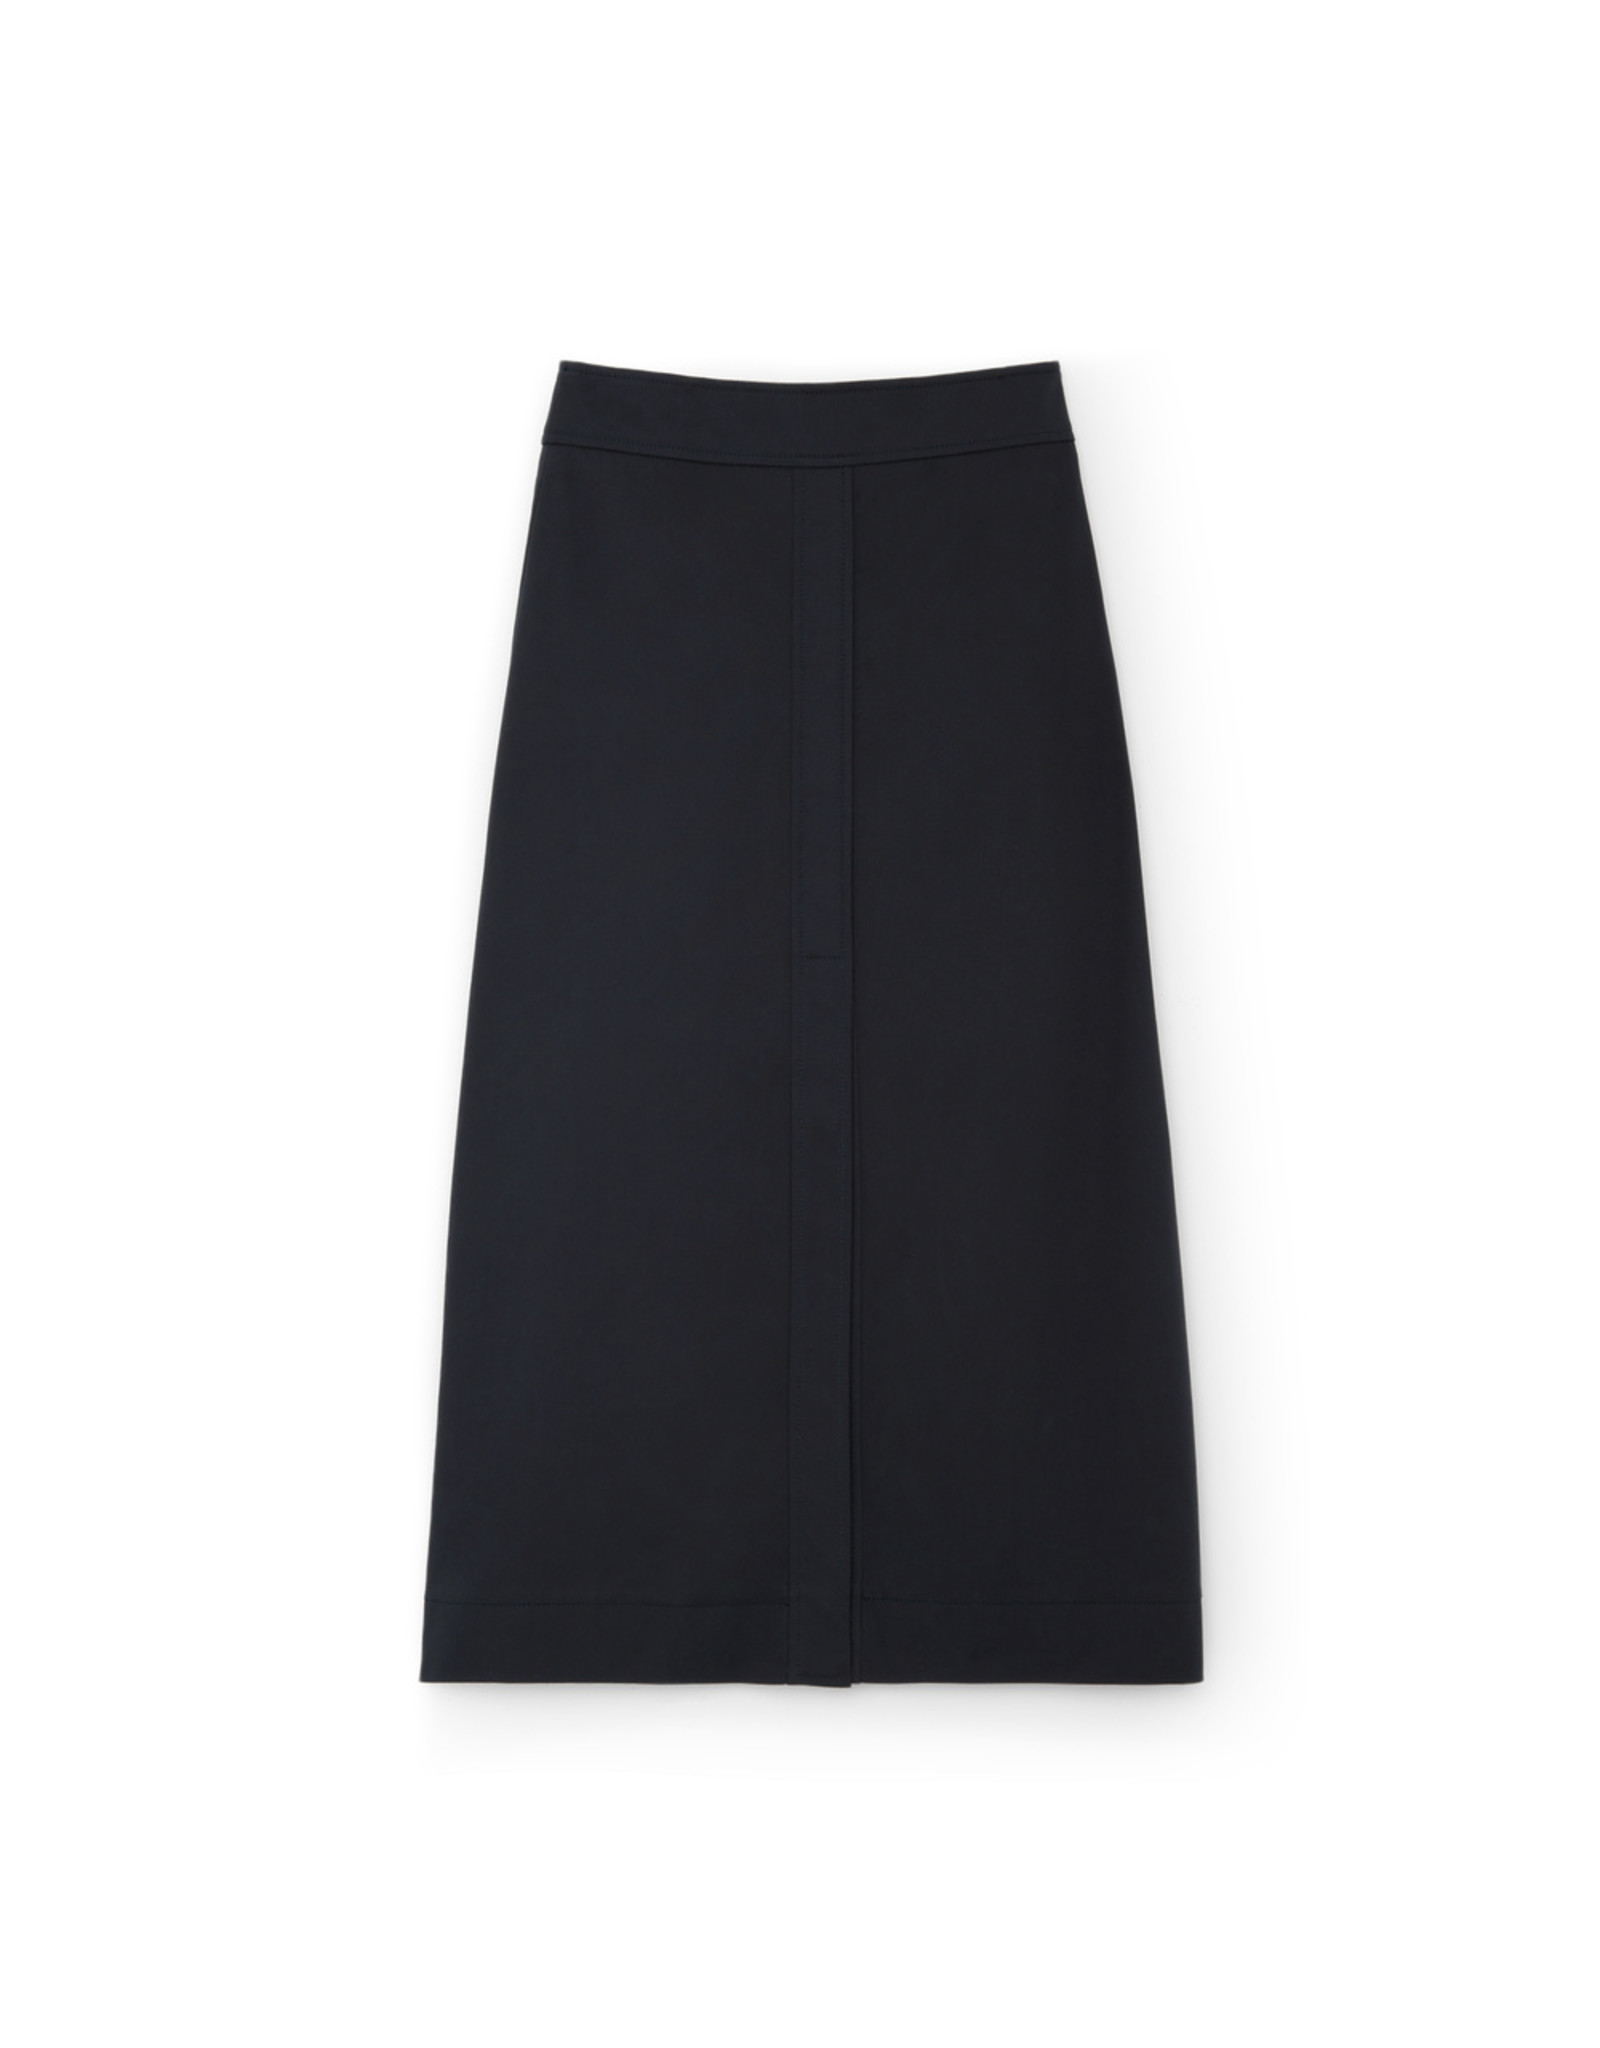 G. Label G. Label Stewart A-Line Cotton Skirt (Color: Navy, Size: 0)